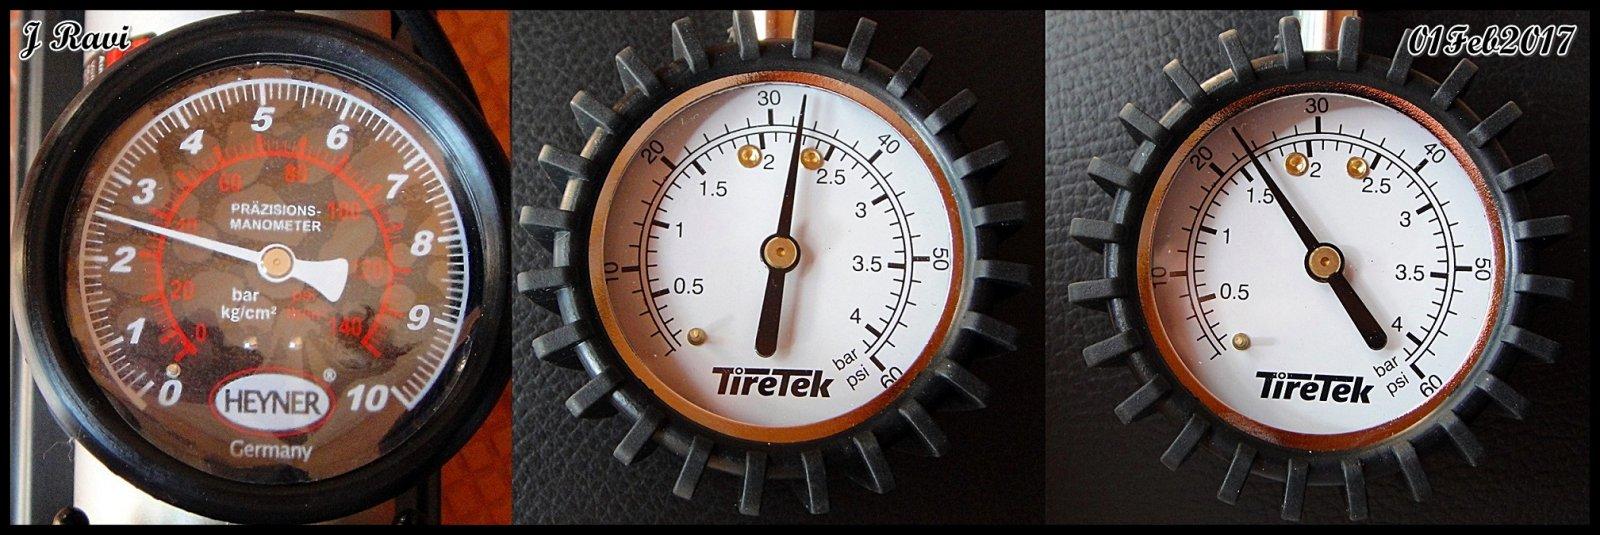 TyrePressure.jpg